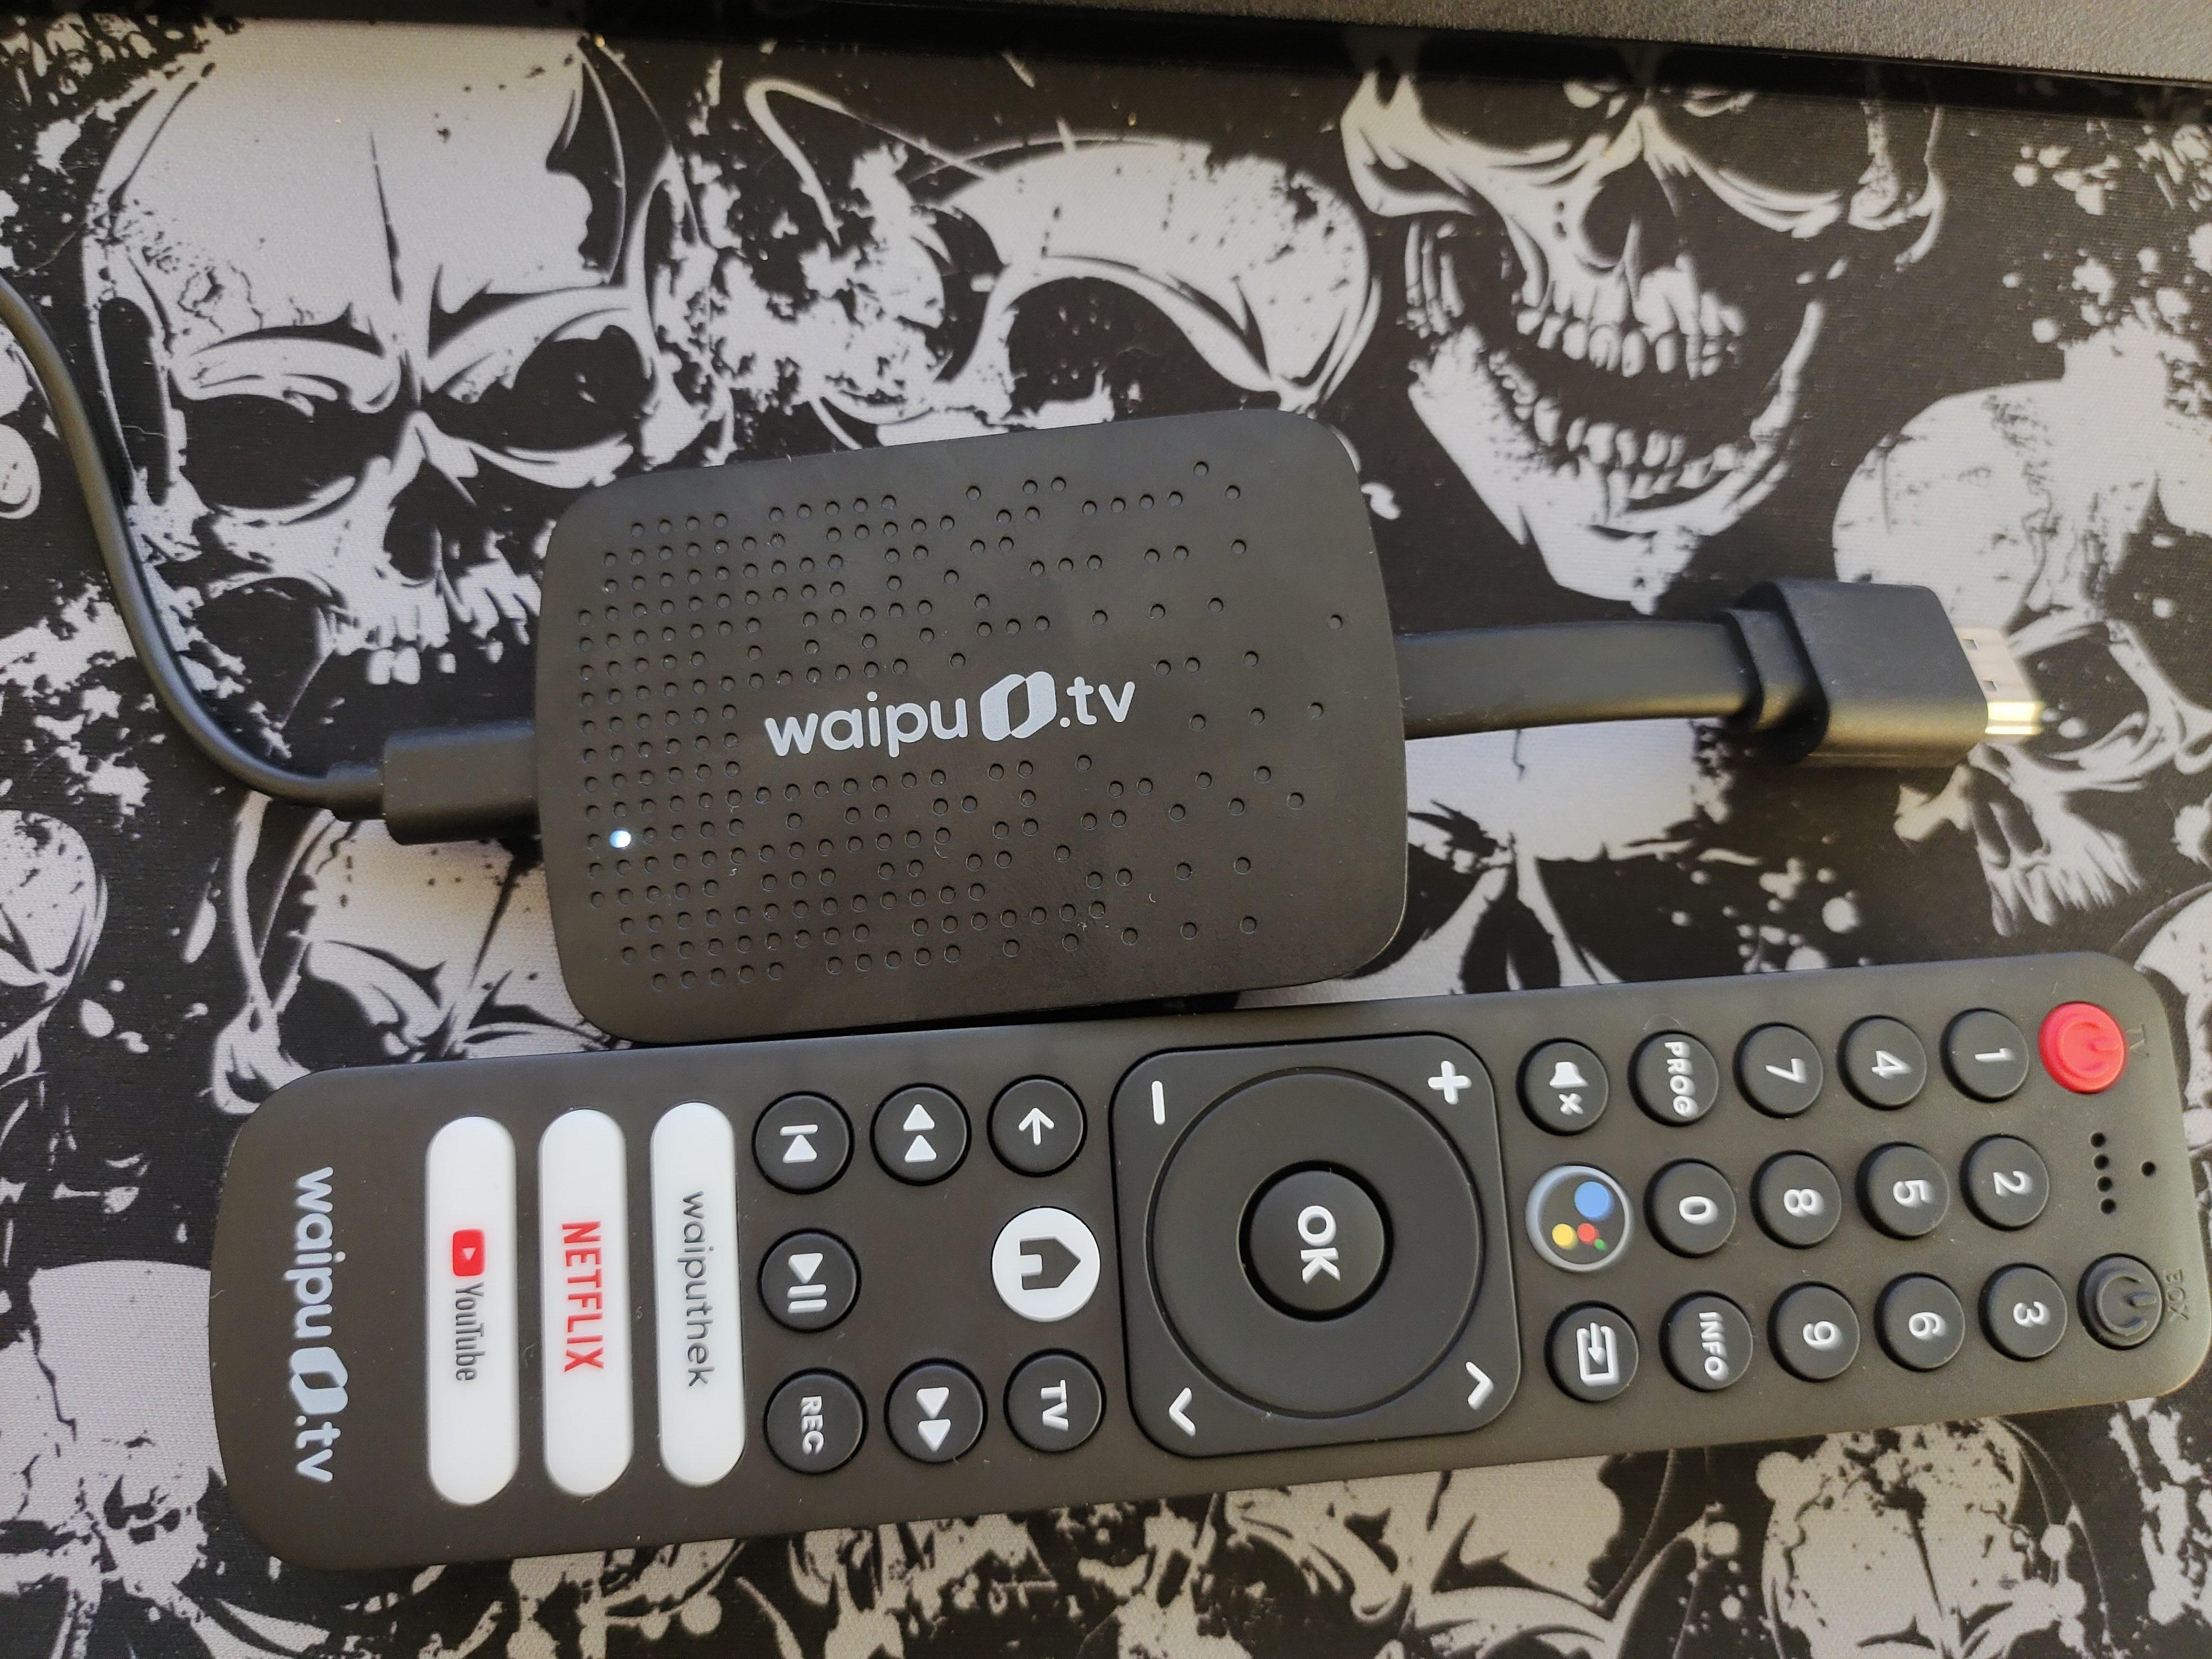 Waipu.Tv 4k stick Fernbedienung und 4K Stick